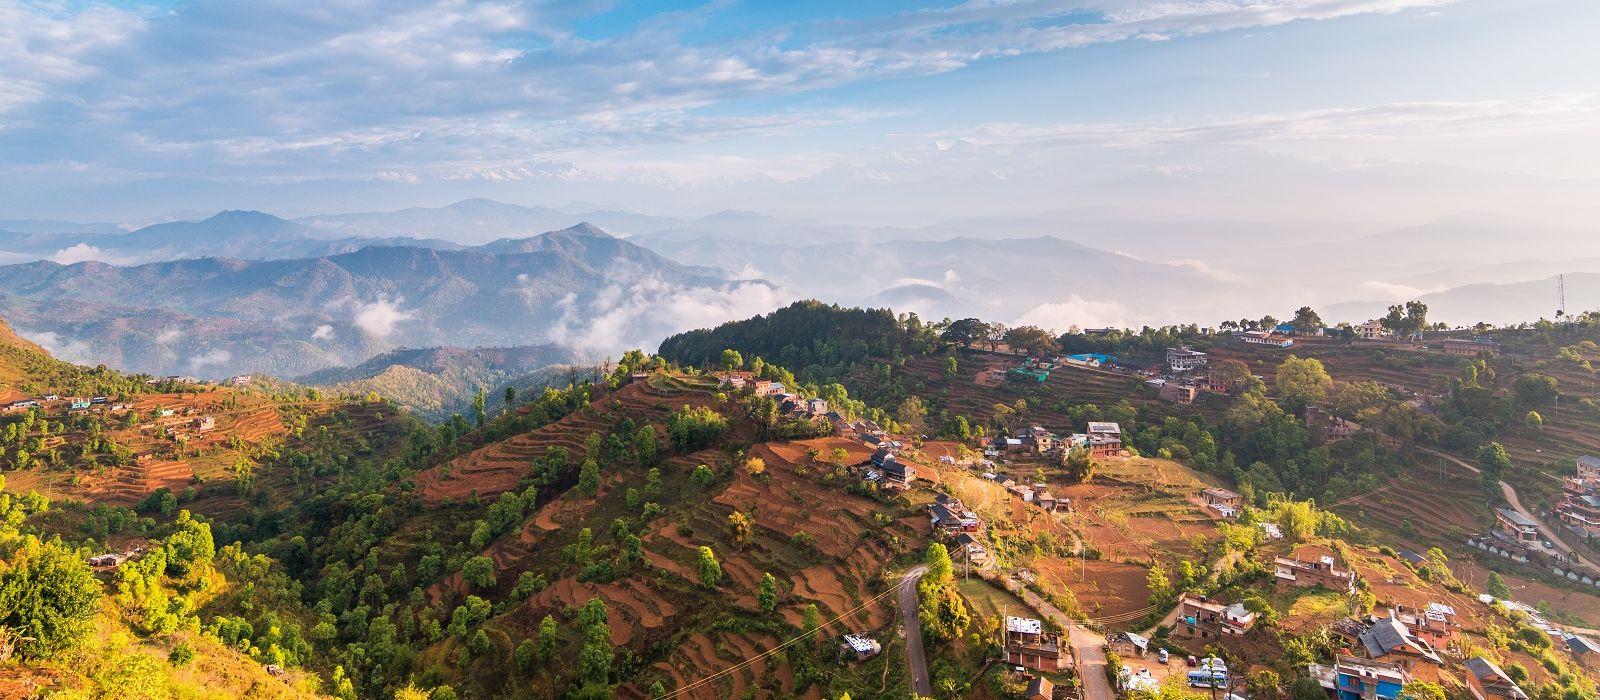 Reiseziel Bandipur, Nepal Nepal